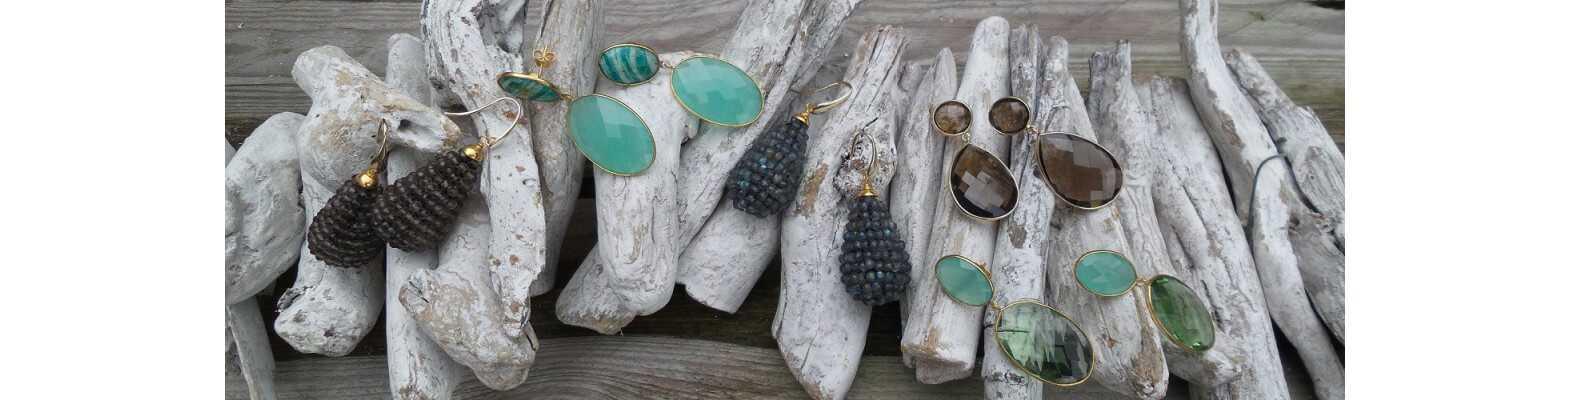 Gold Plated Gemstone Jewelry